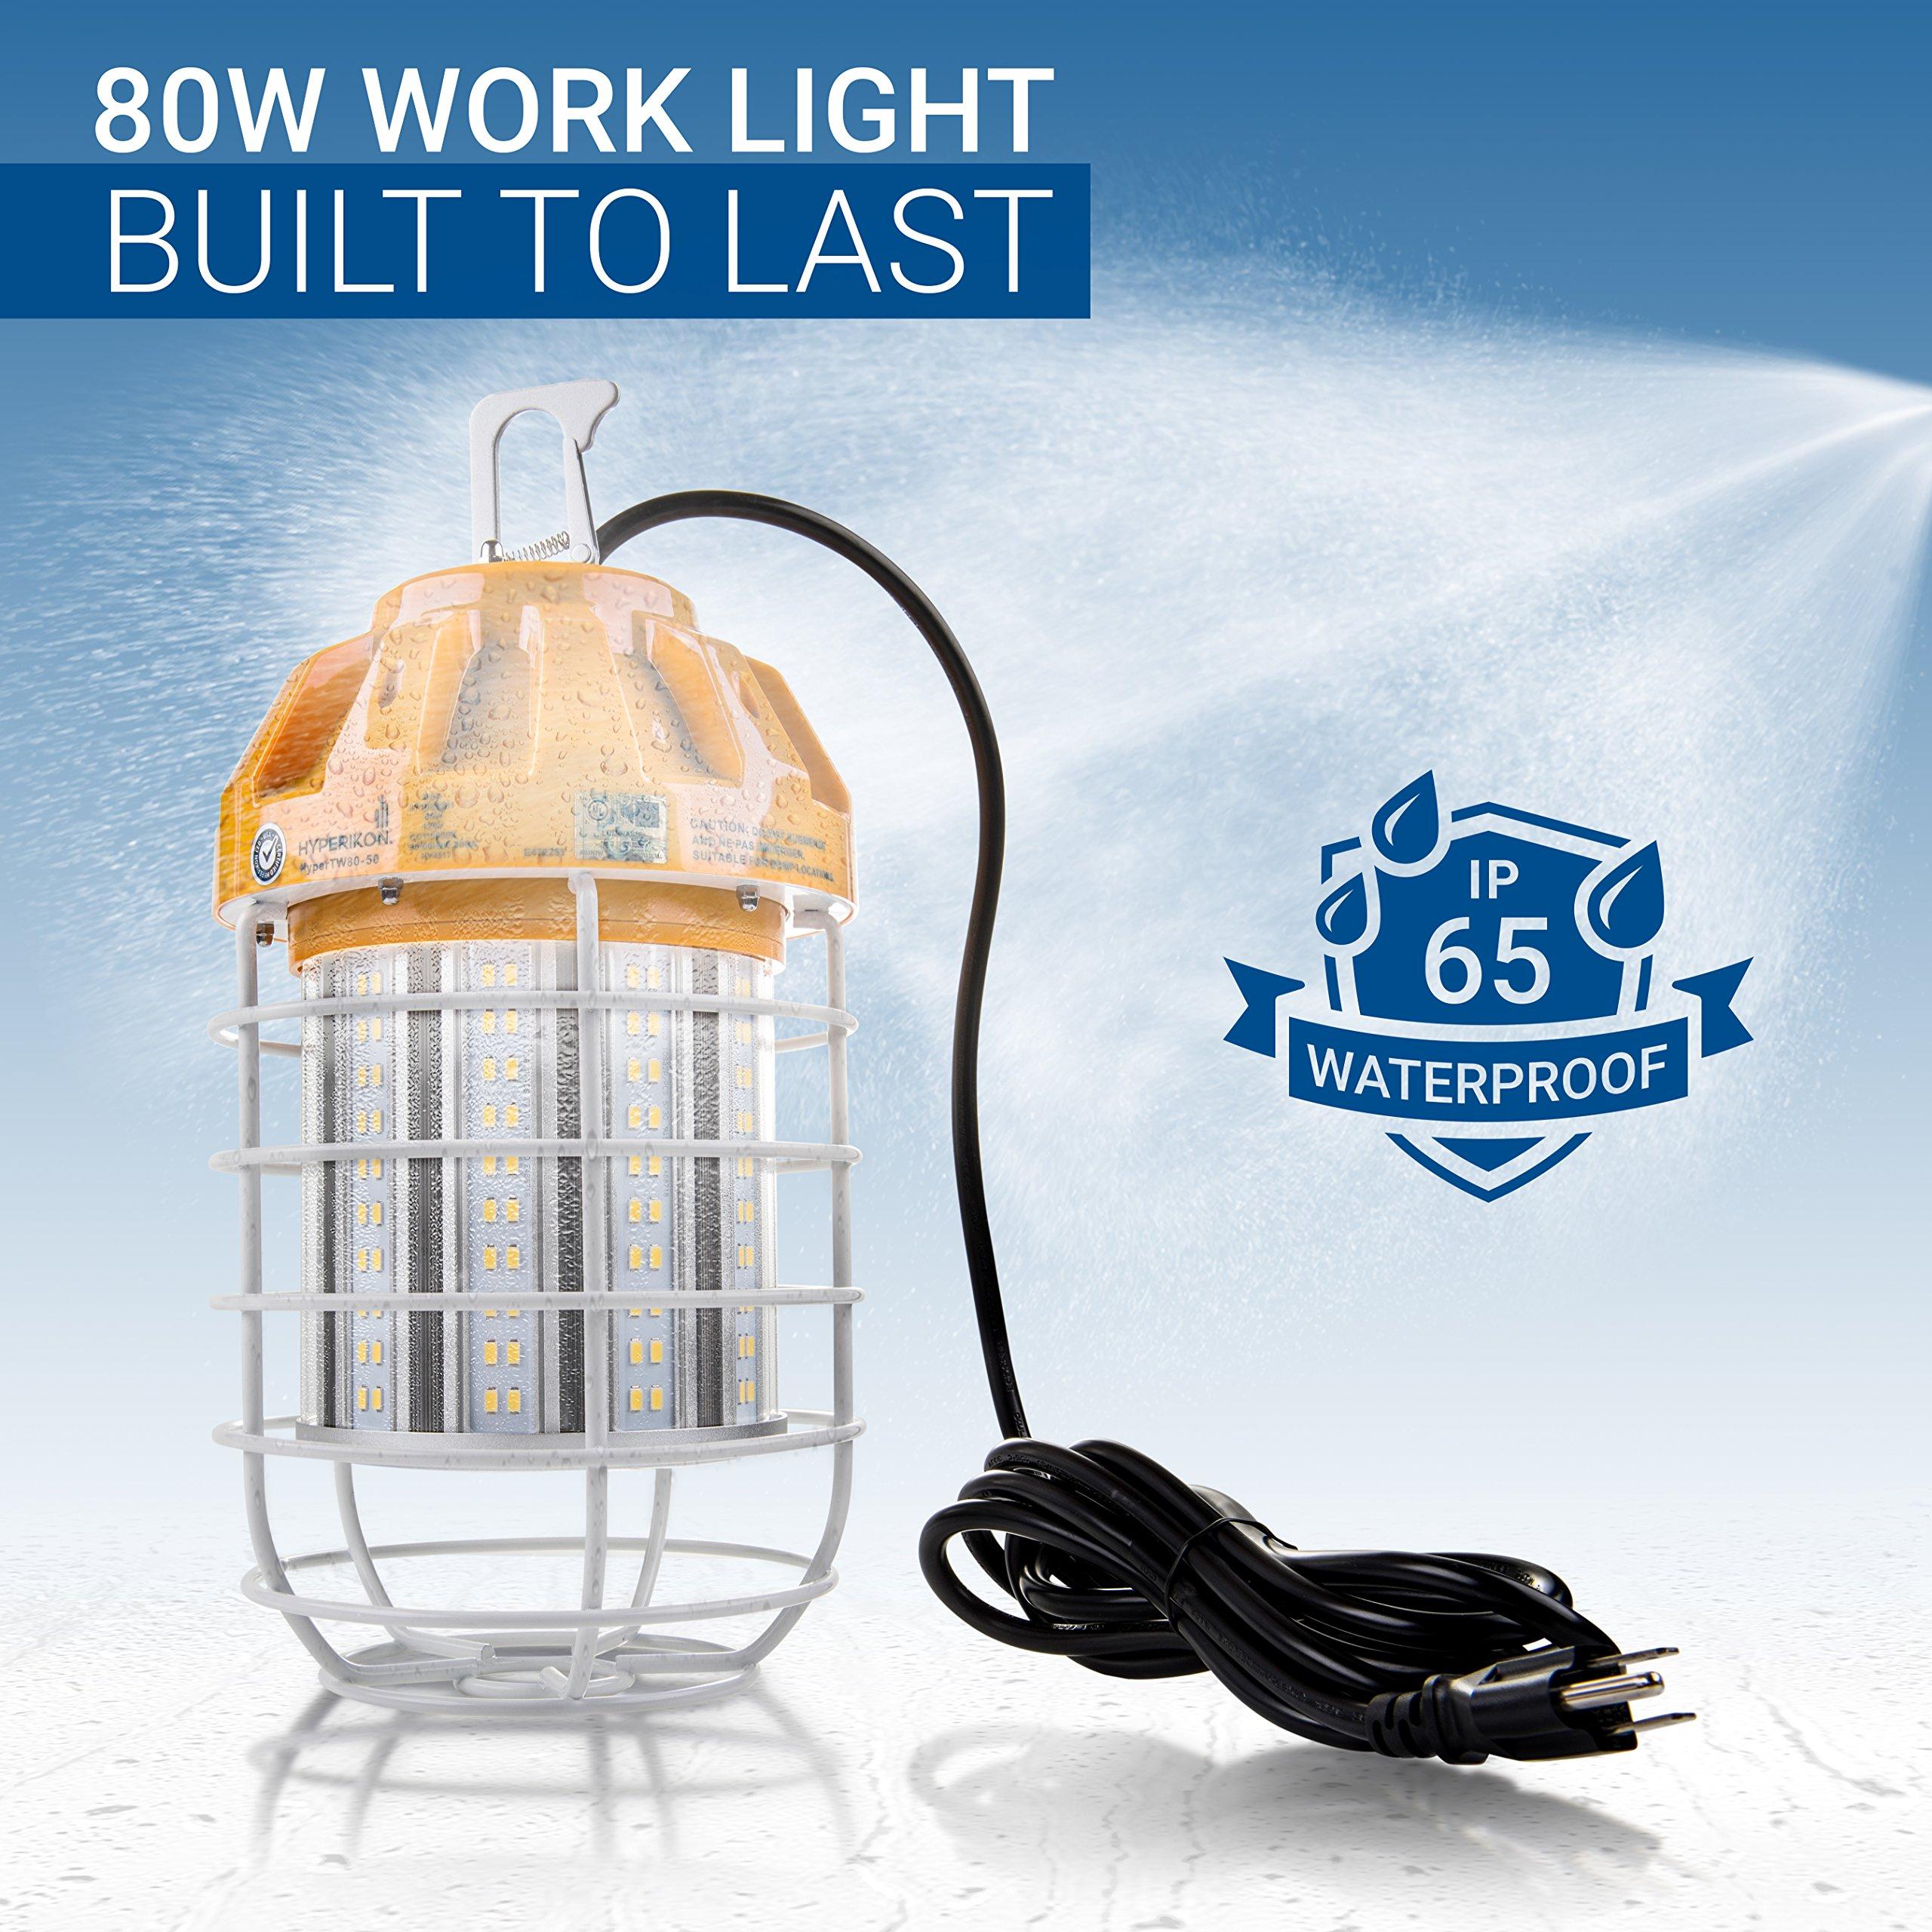 Hyperikon 80W LED Temporary Work Light Fixture, 9600 Lumens, Orange Construction Drop Light, LED High Bay Lighting, UL IP65 Waterproof, 5000K by Hyperikon (Image #5)